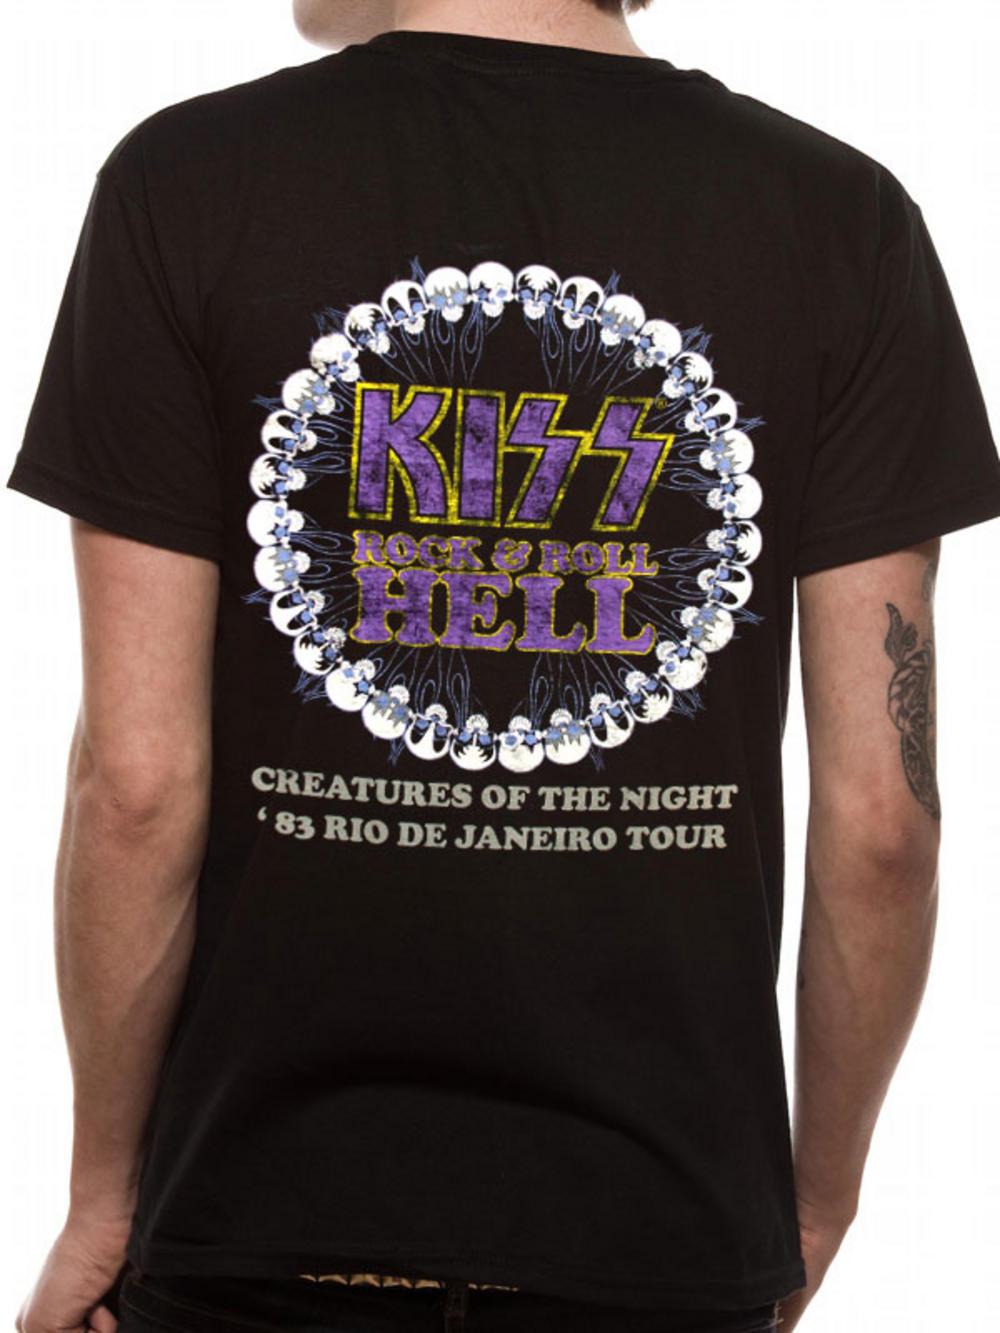 Kiss (Creatures Of The Night) T-shirt Thumbnail 2